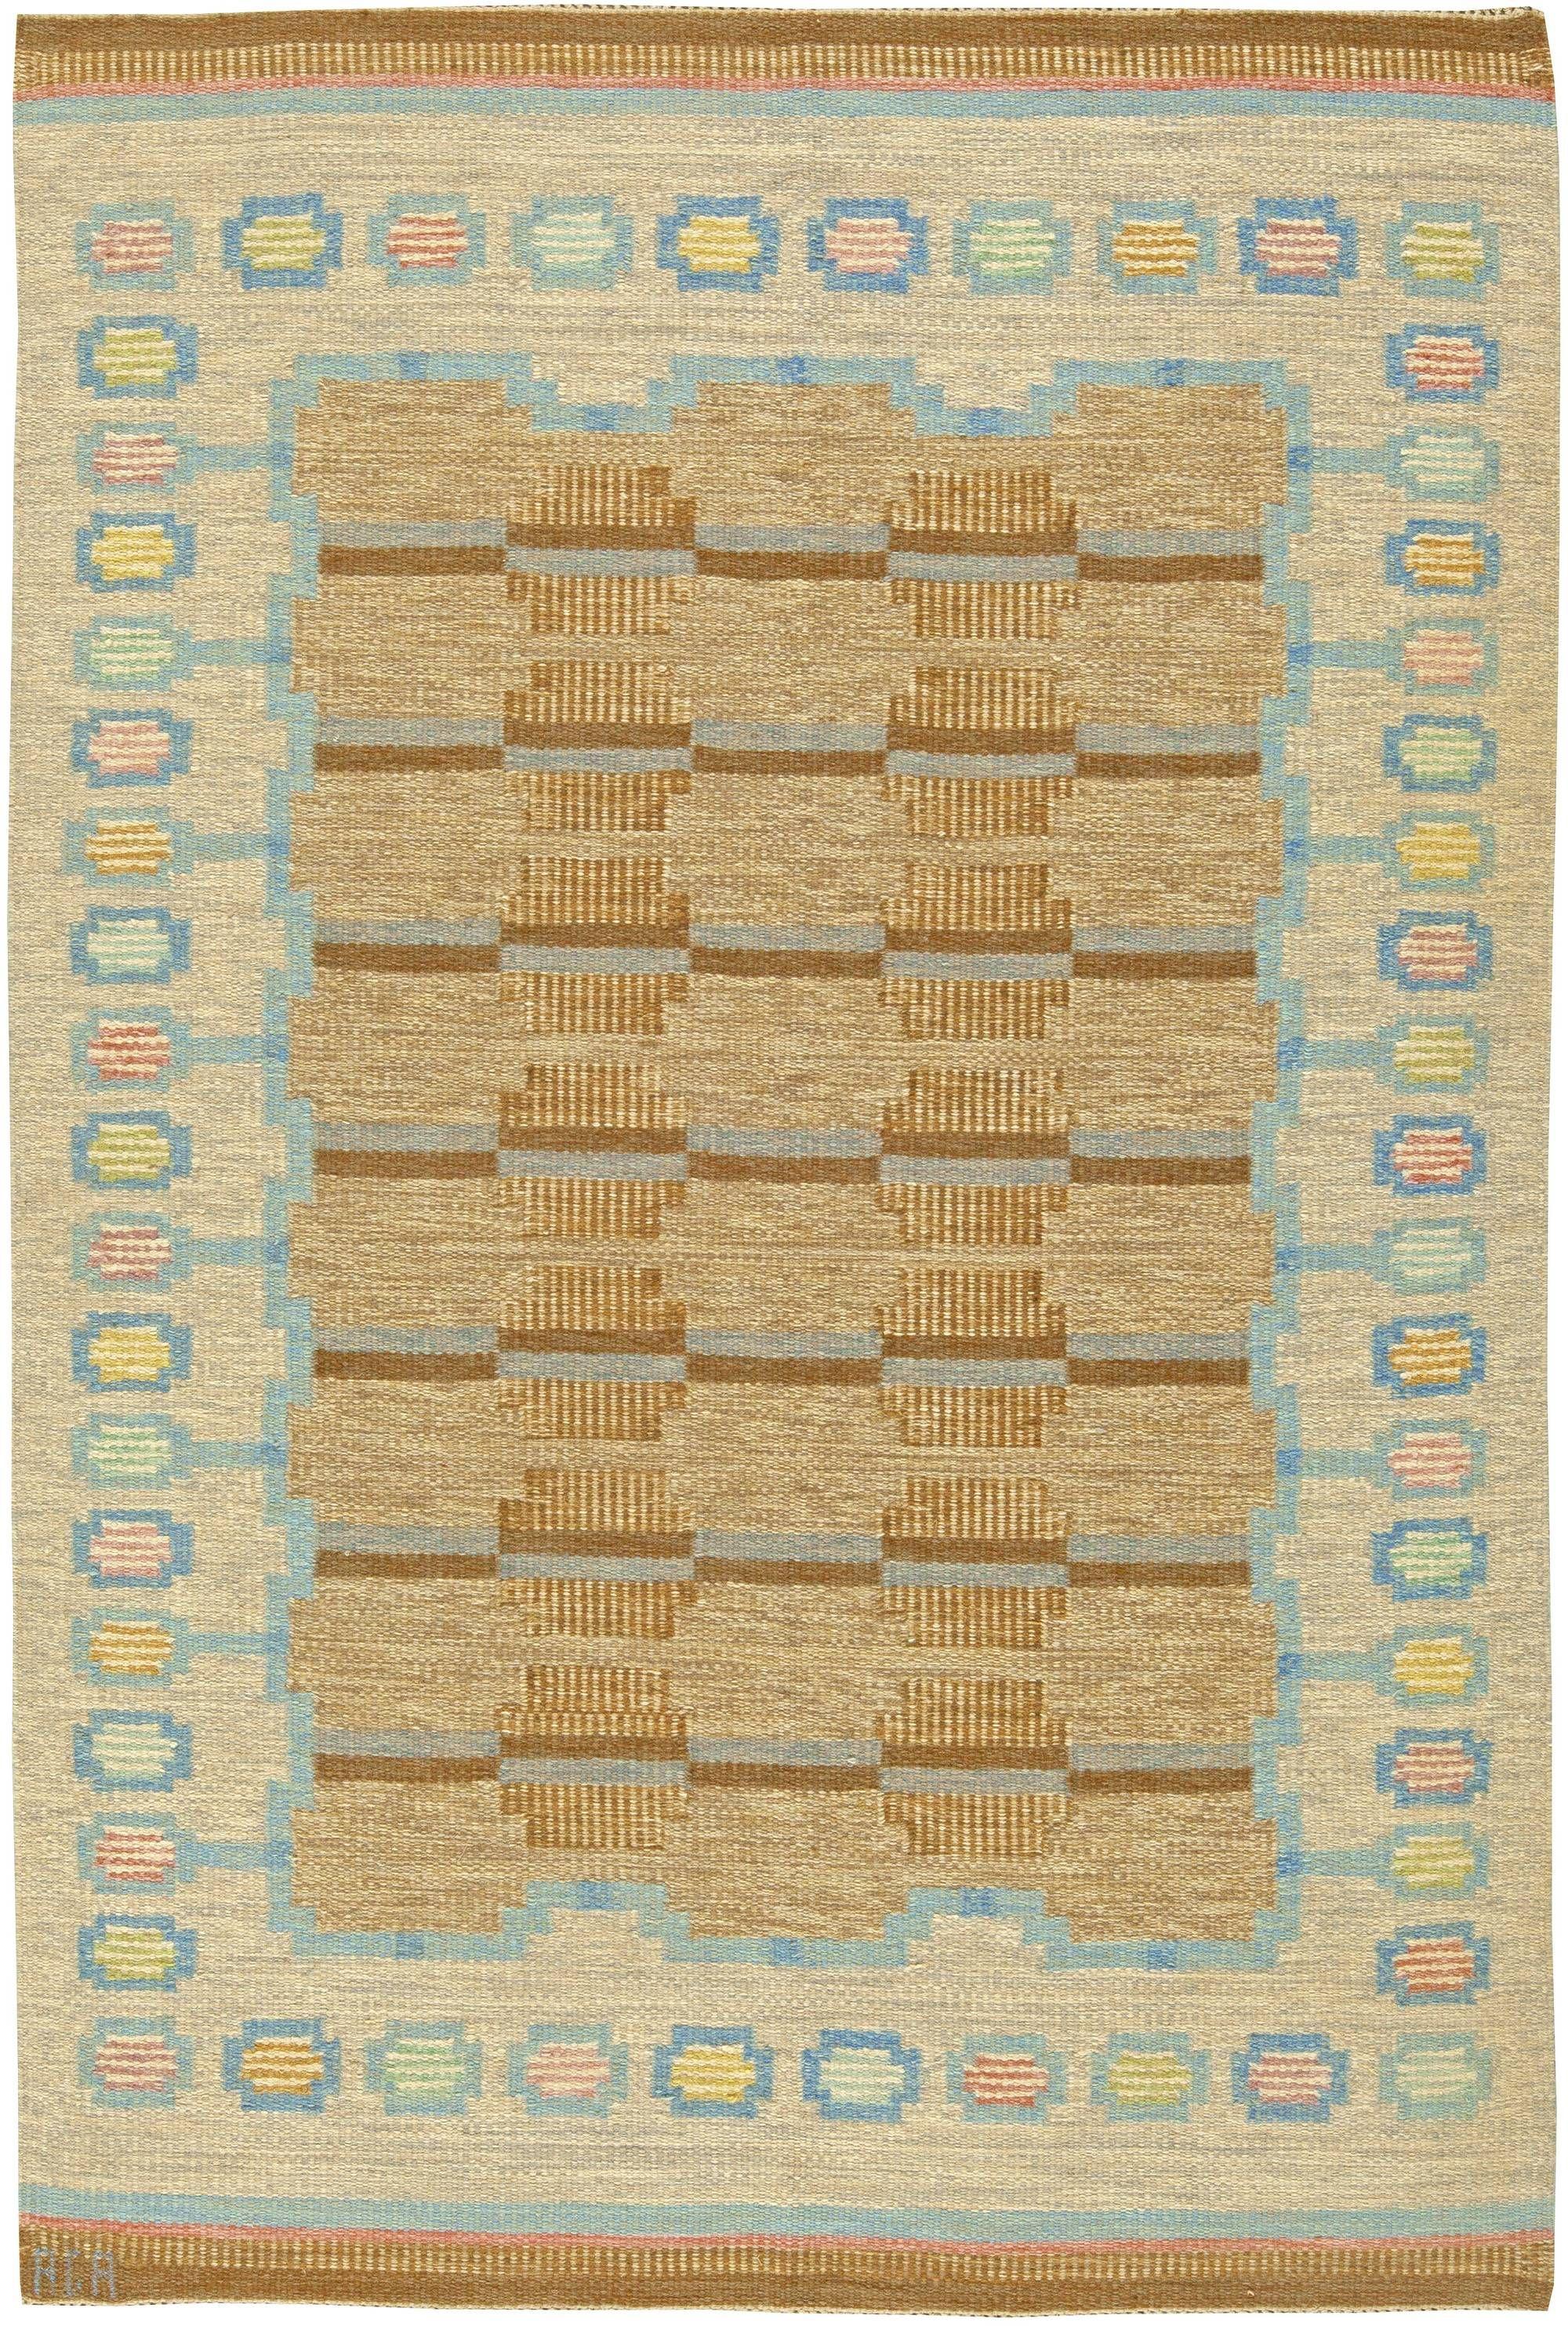 Antique Rug Antique Carpets Antique Persian Rugs Tabriz Rugs Custom Rugs Vintage Swedish Flatweave Rug Signed By Scandinavian Rug Flat Weave Rug Swedish Rug